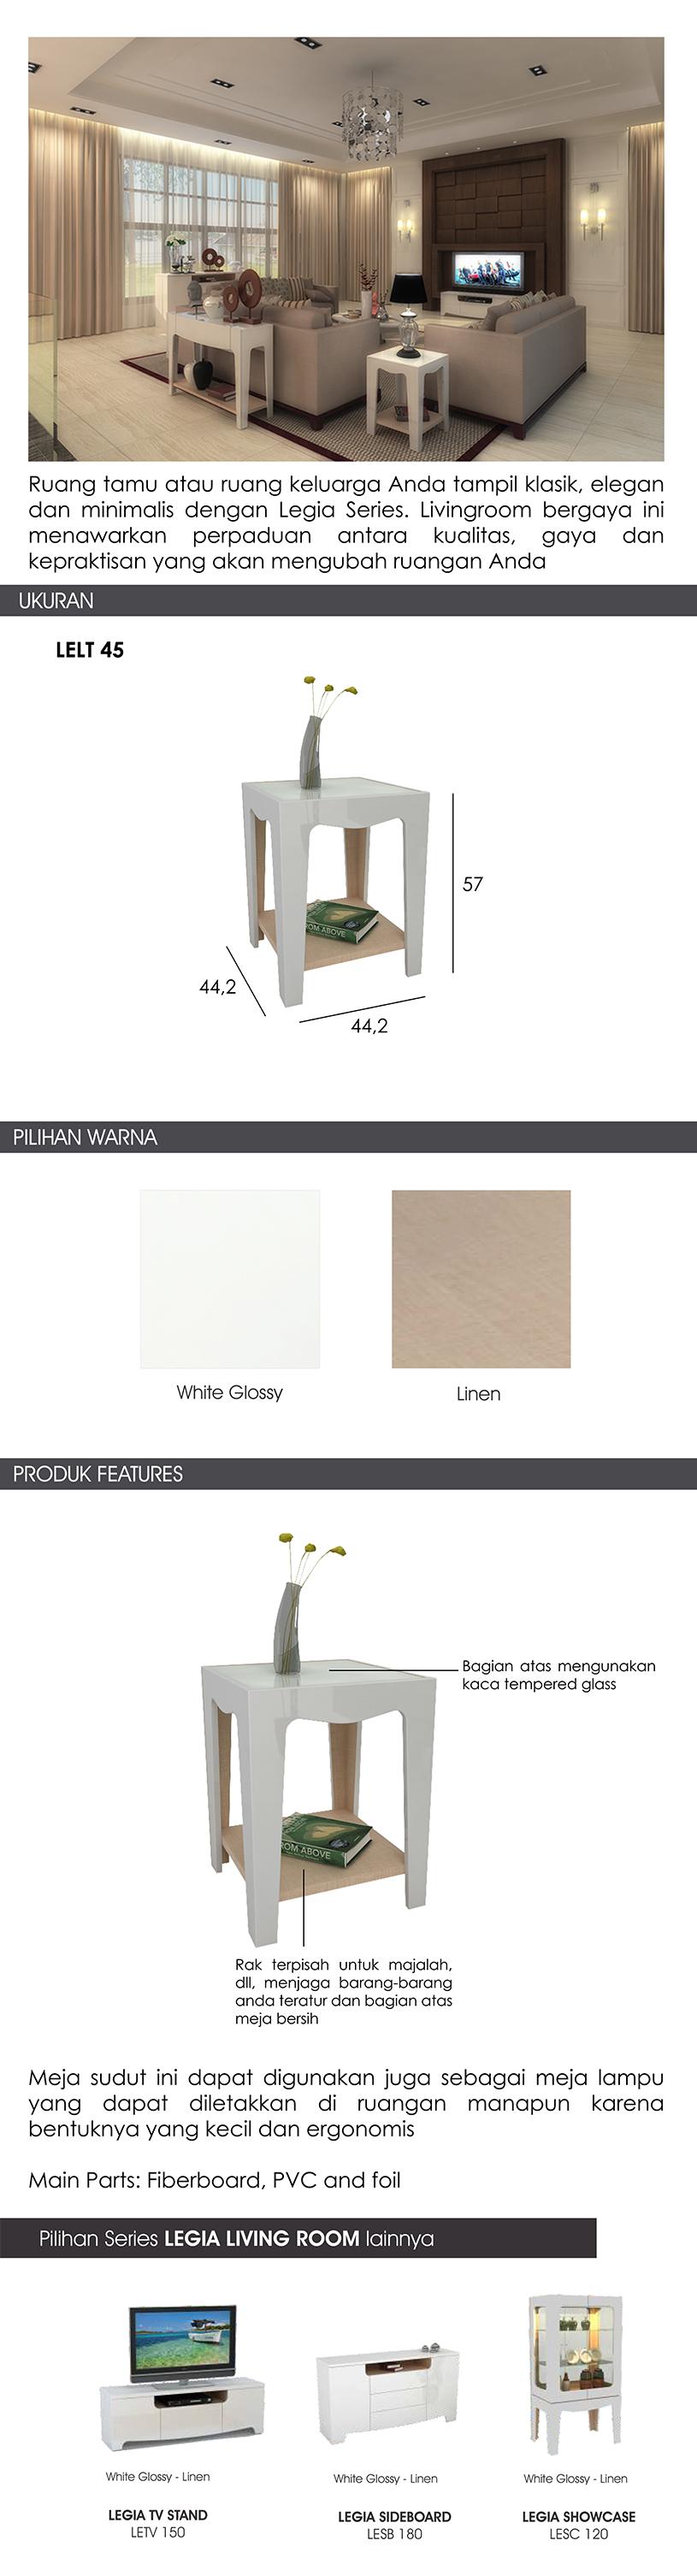 Pro Design Vector Sideboard White Glossy Grey Khusus Jawa Romanov Rak Tv 2 Laci Sanremo Dark Beige Leather Black Legia Meja Sudut Linen Bali